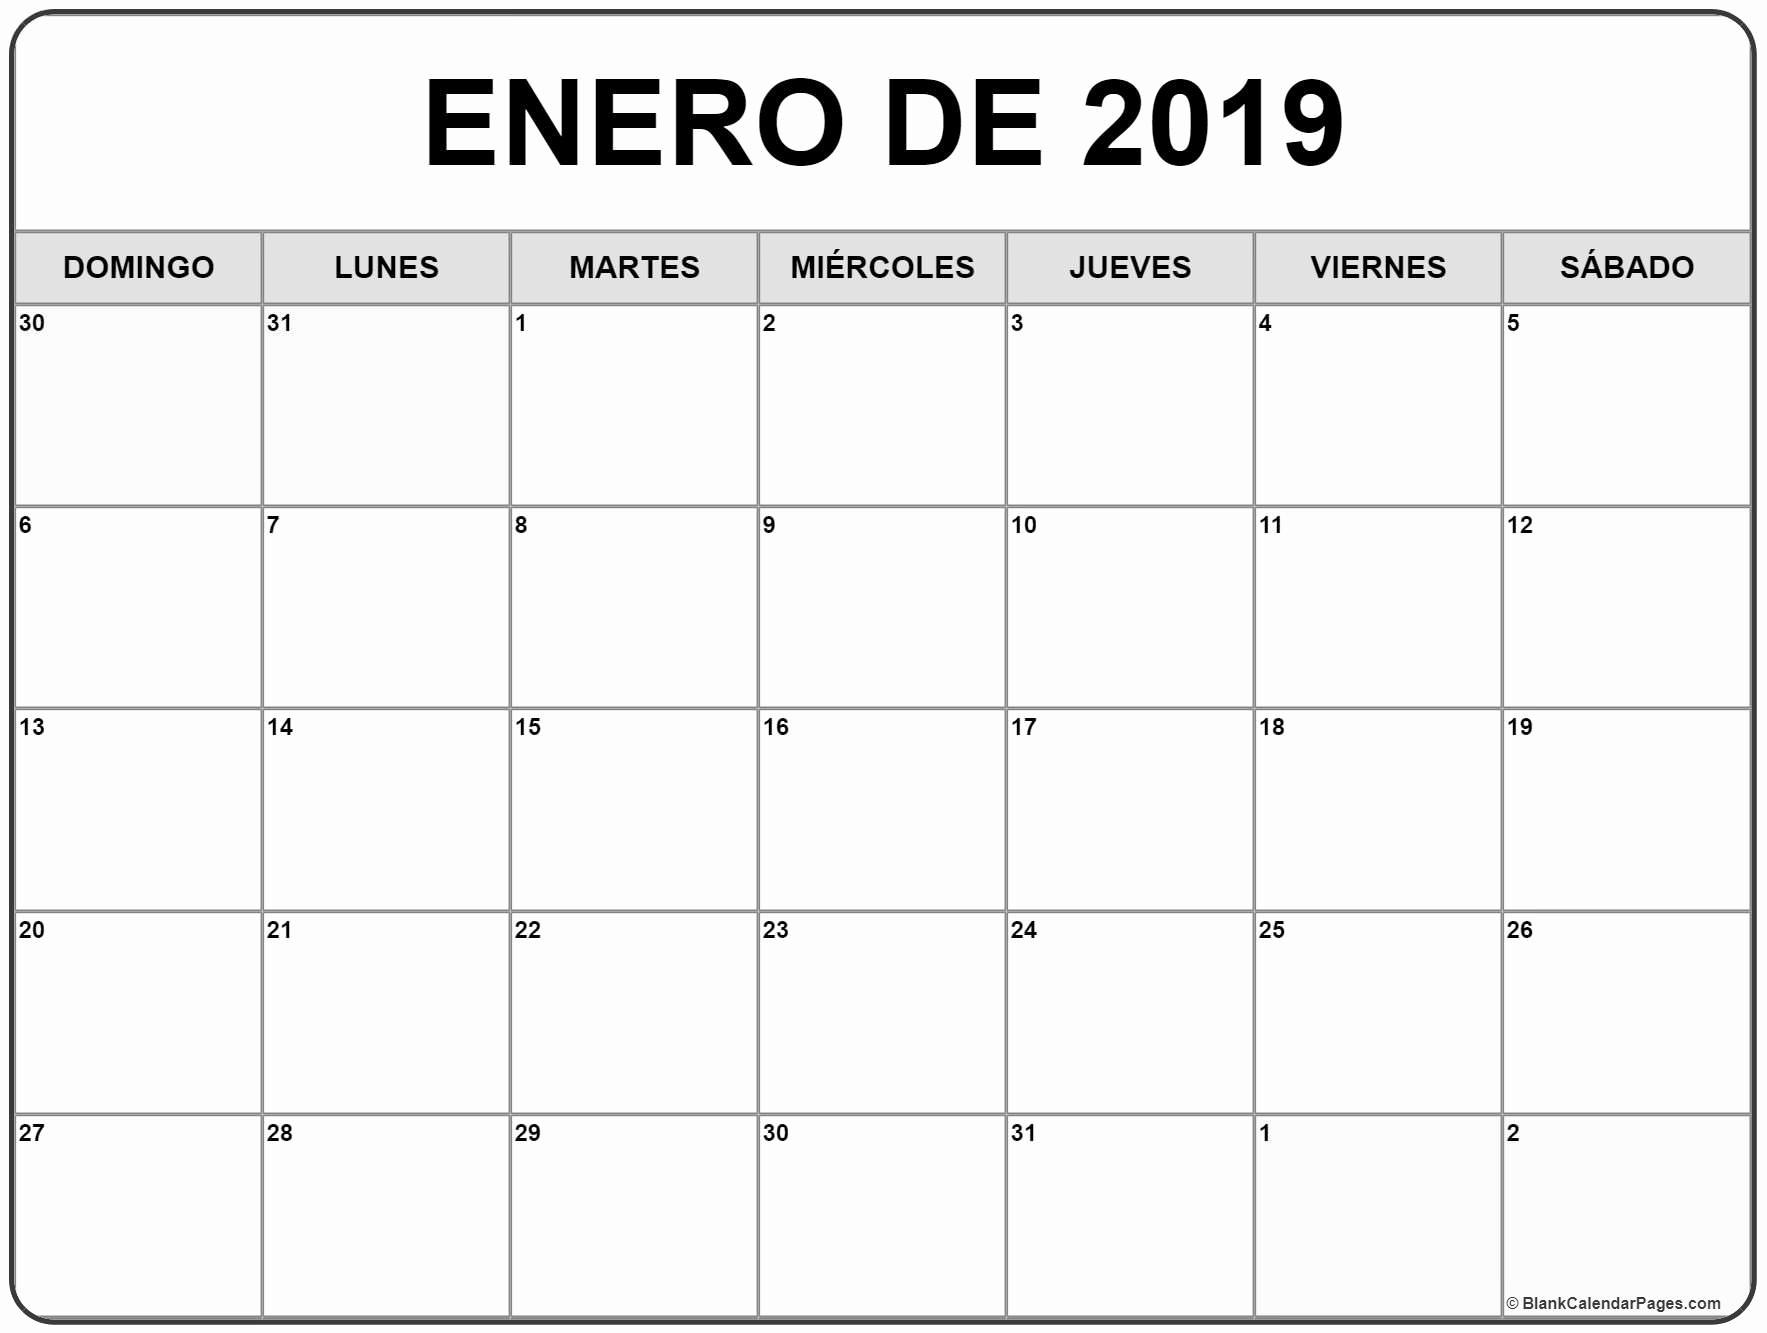 Calendario 2019 Com Feriados Nacional Más Actual Calendario Dr 2019 Calendario 2019 Of Calendario 2019 Com Feriados Nacional Actual Evaluar Calendario 2019 Con Sus Feriados